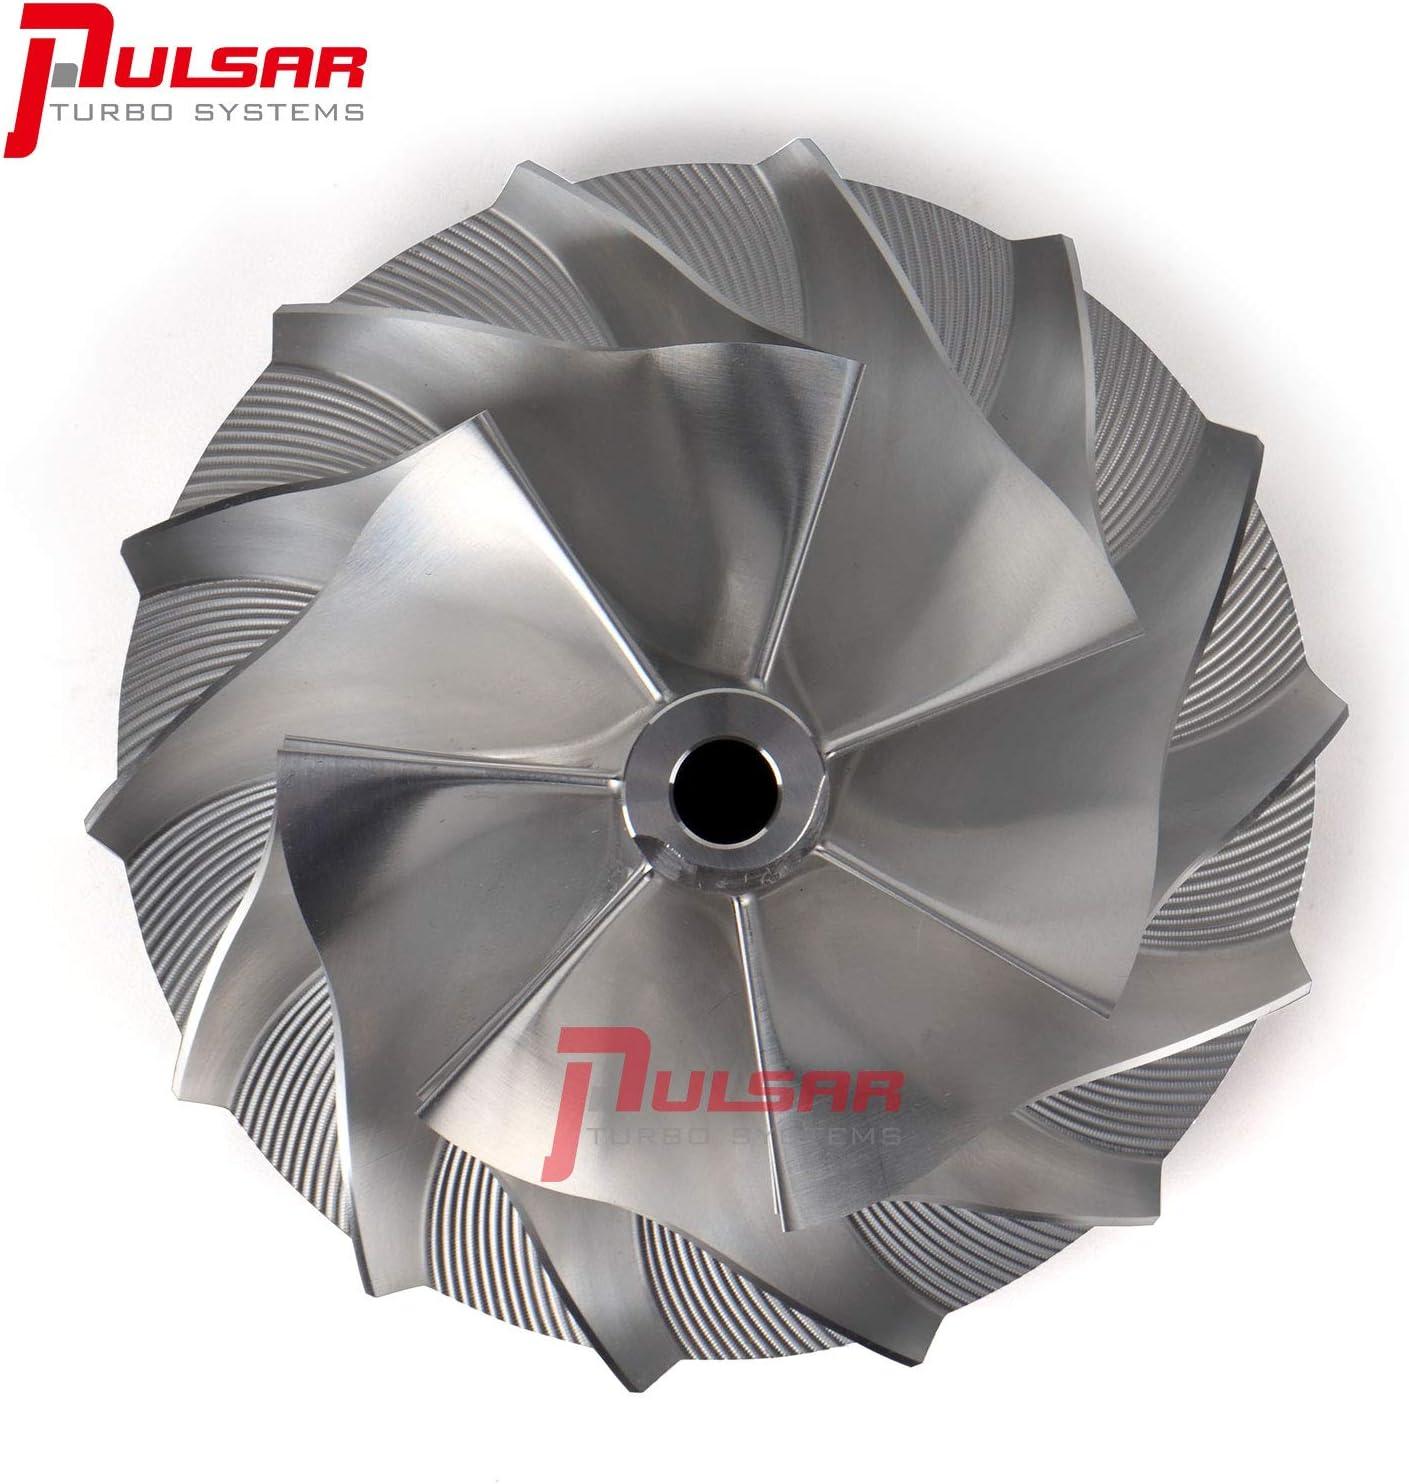 PULSAR 04.5-19 Dodge Ram Cummins 5.9 6.7 HE351CW HE351VE HE300VG ...